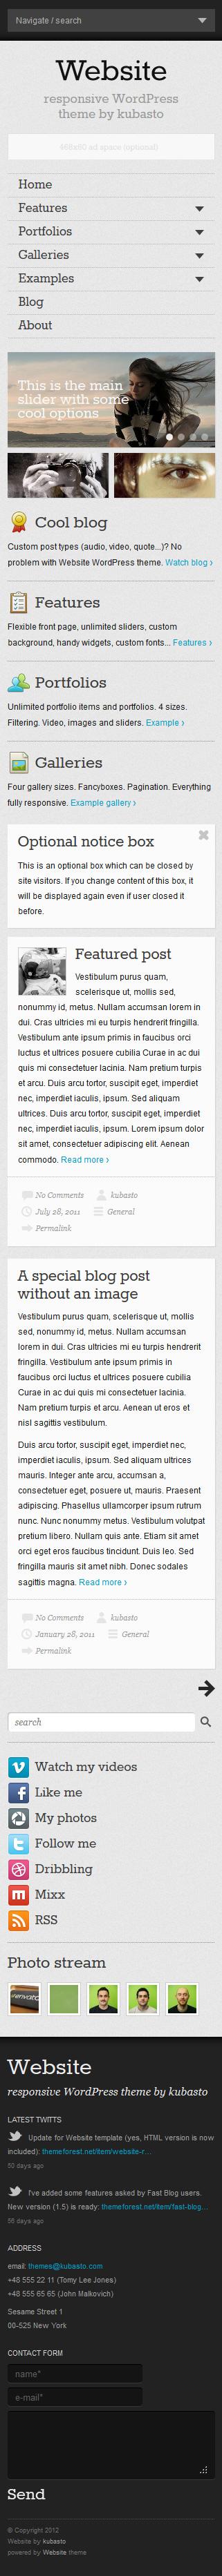 Website - Responsive WordPress Theme by WebberWebber   ThemeForest